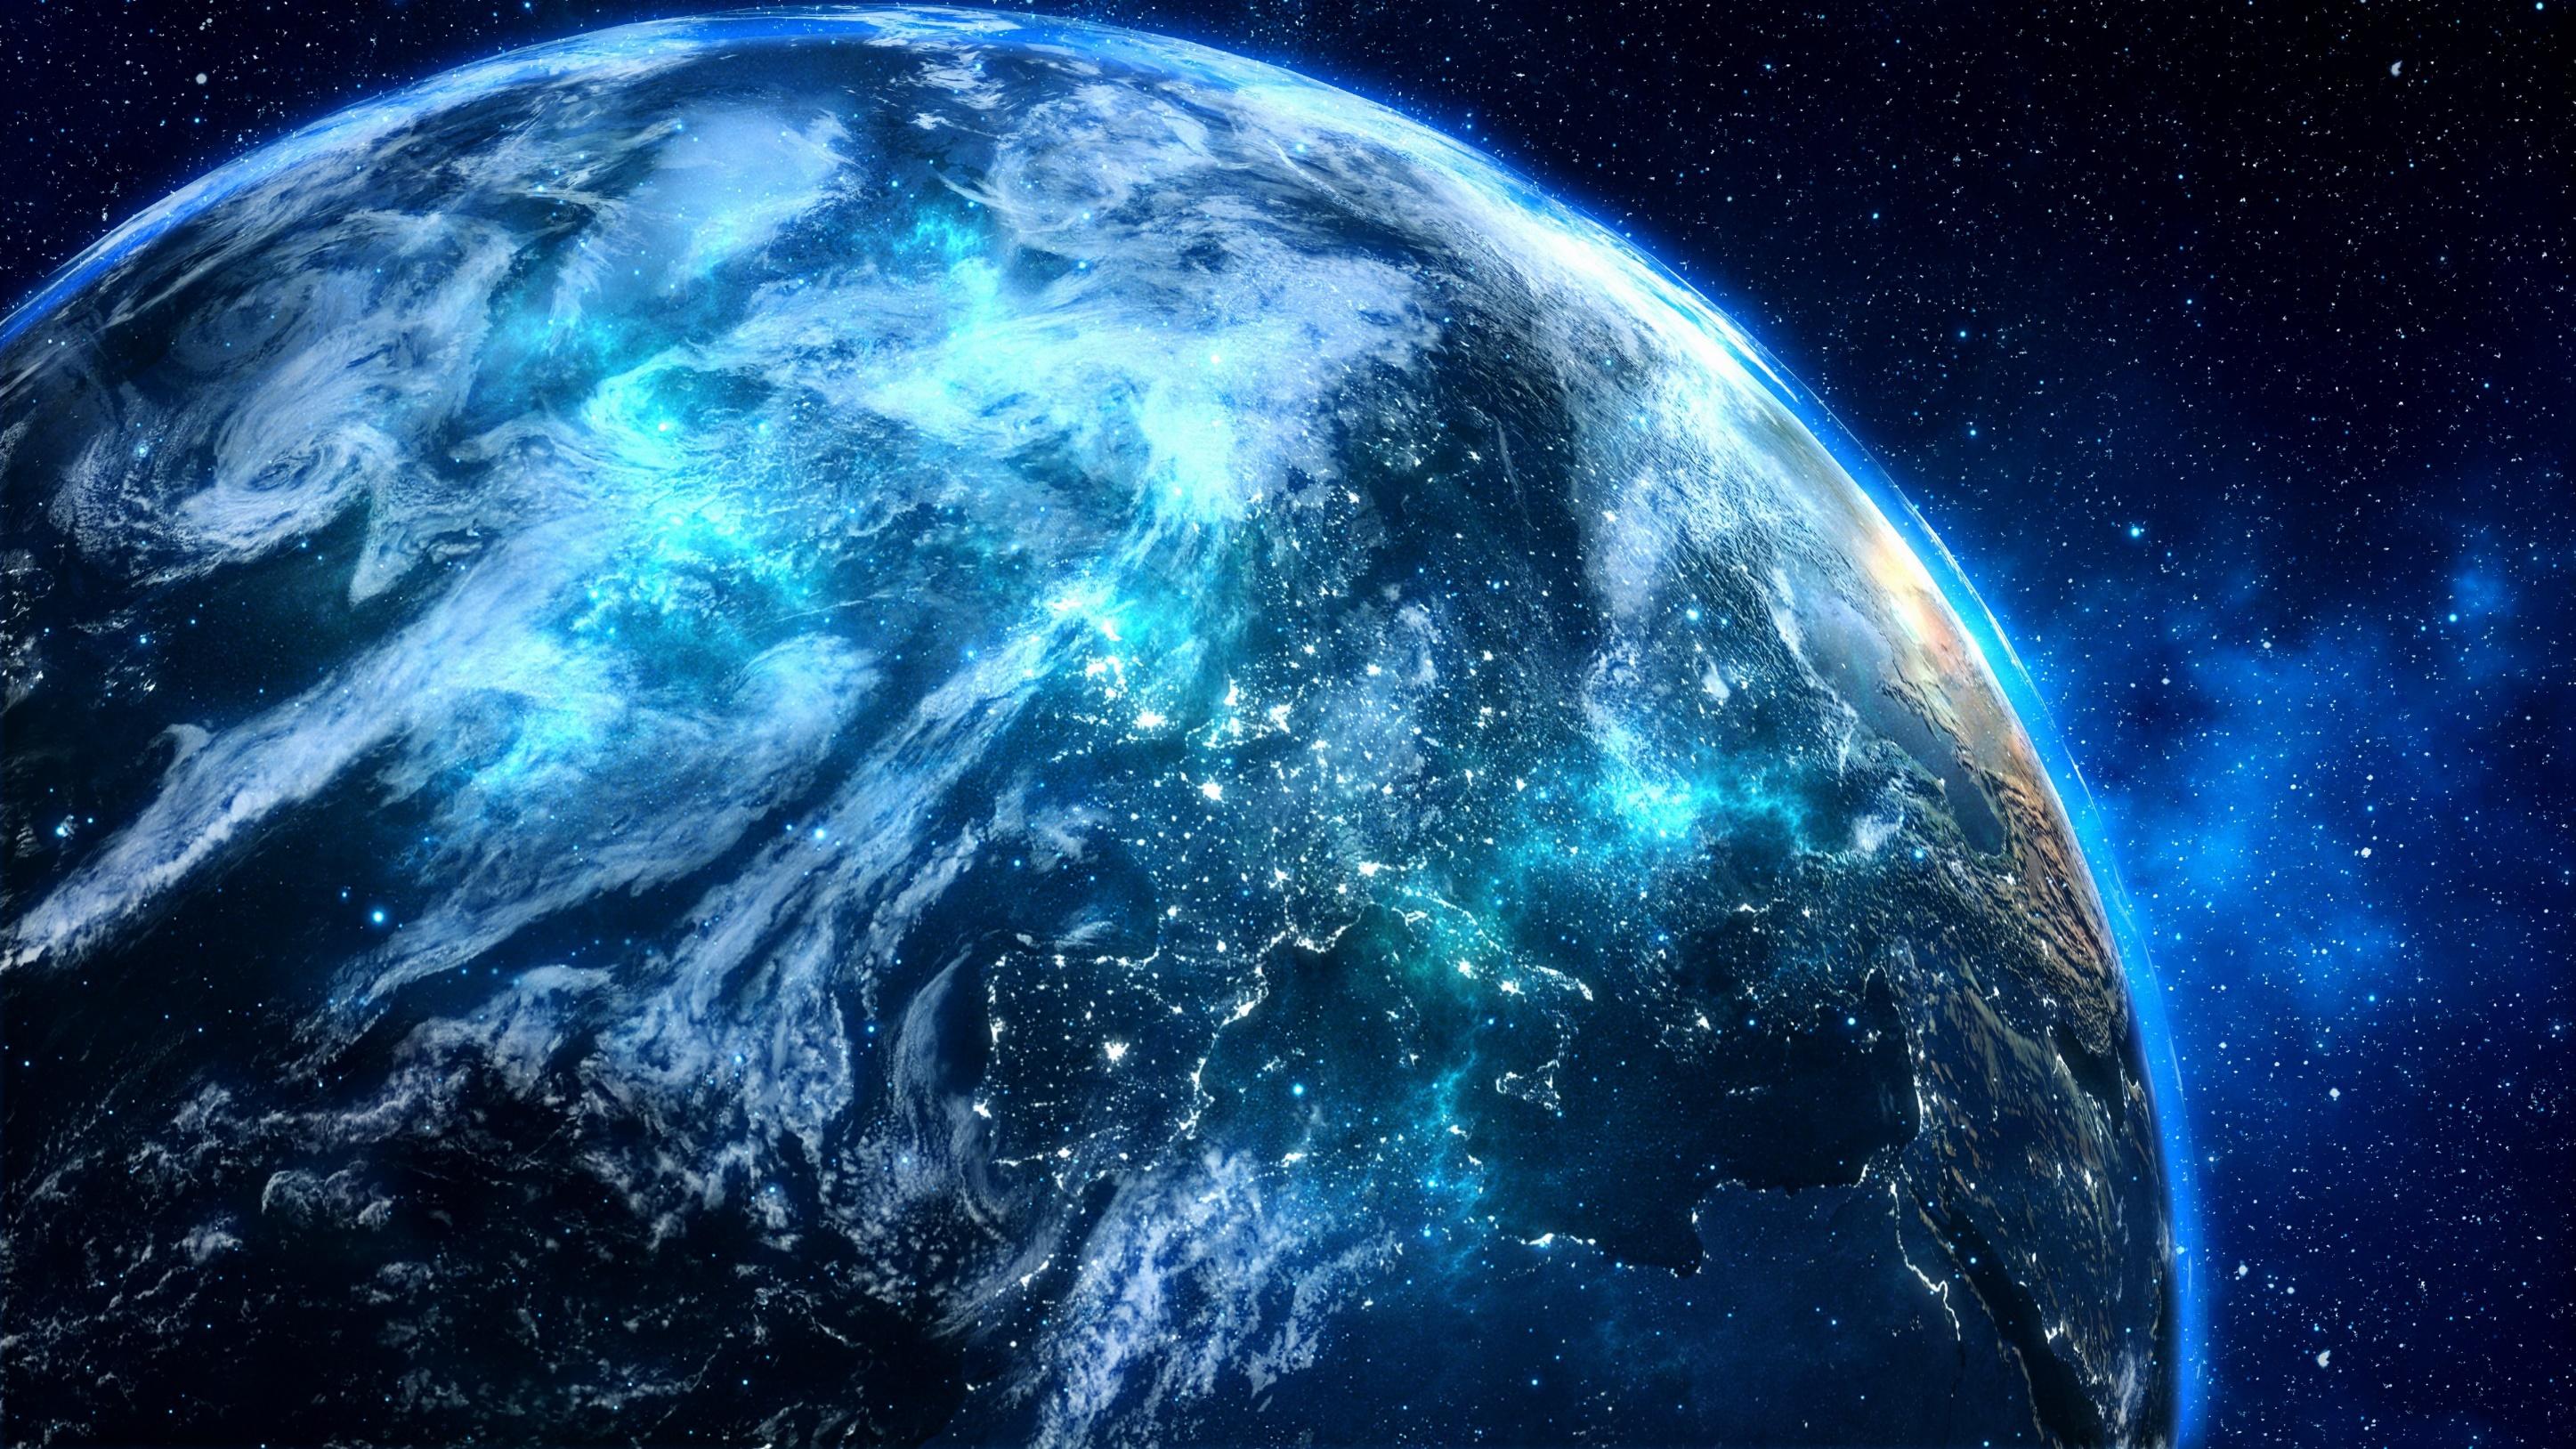 Blue Digital Planet, HD Digital Universe, 4k Wallpapers ...